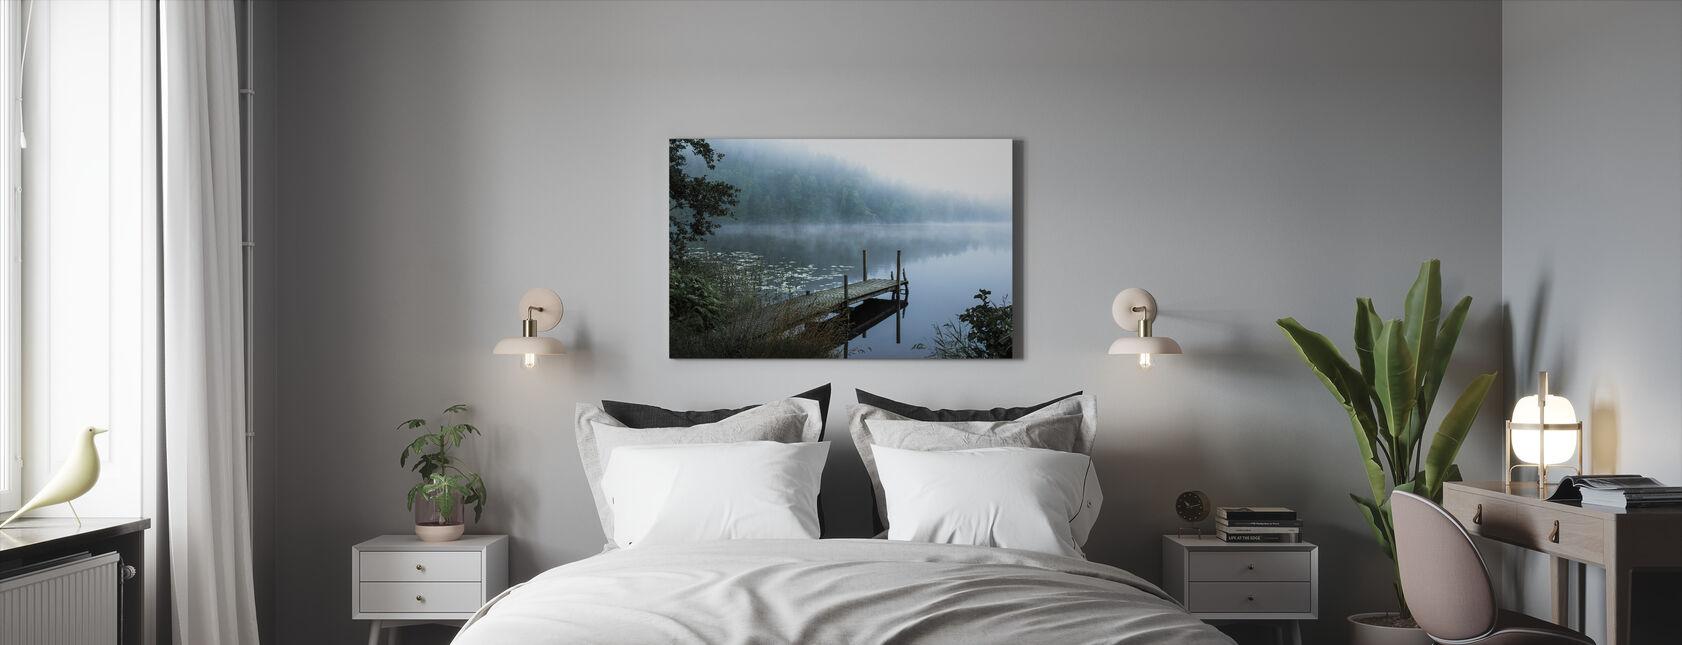 Moody Aamu - Canvastaulu - Makuuhuone